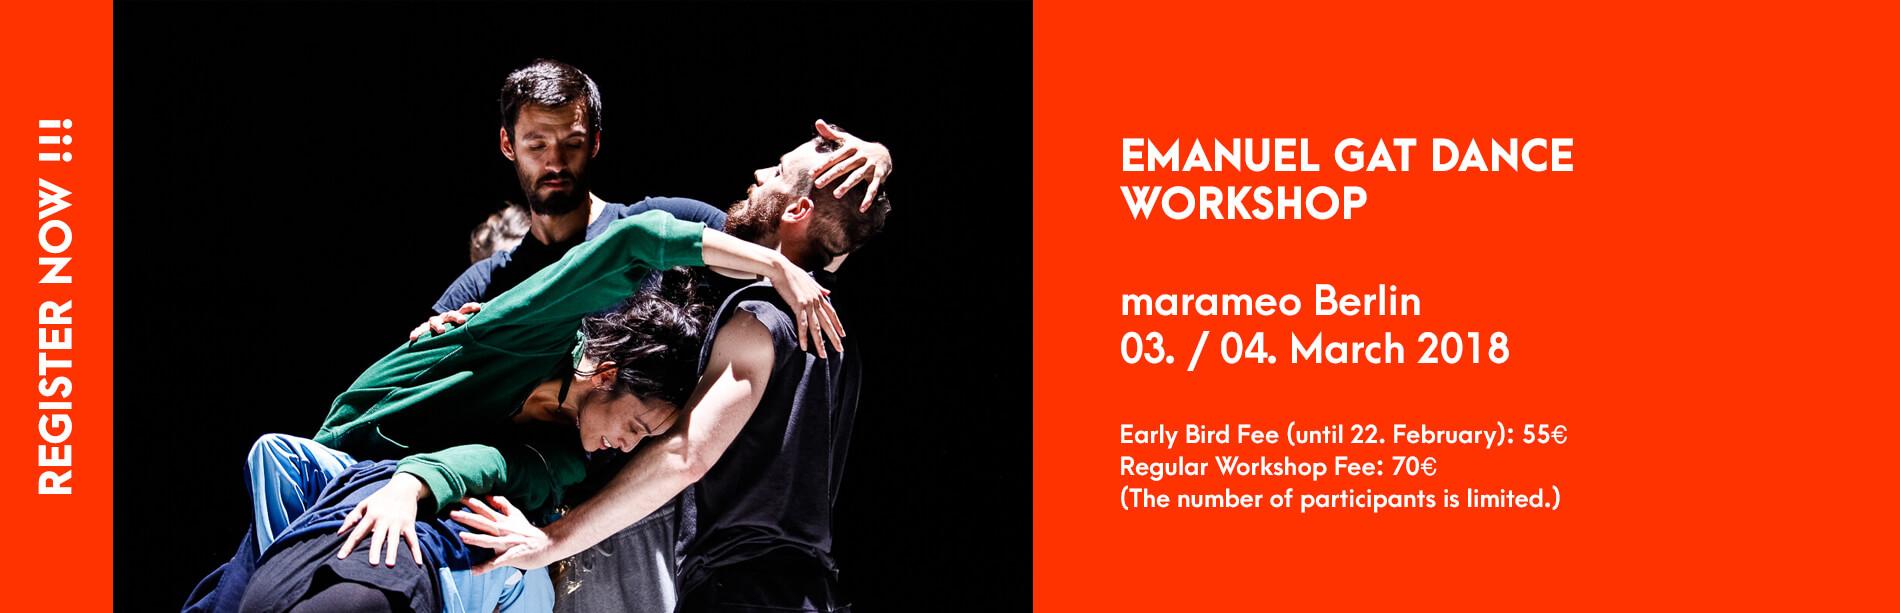 Emanuel Gat Workshop Marameo Berlin